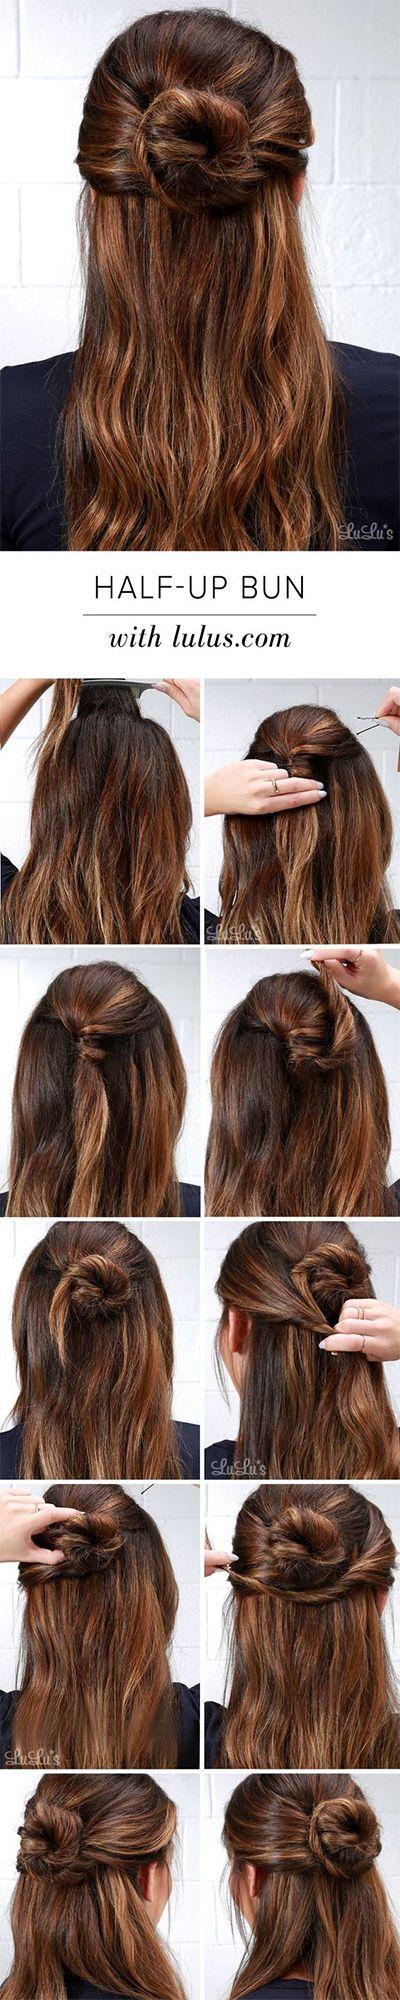 25 Best Ideas About Half Up Bun On Pinterest Half Up Hairstyles